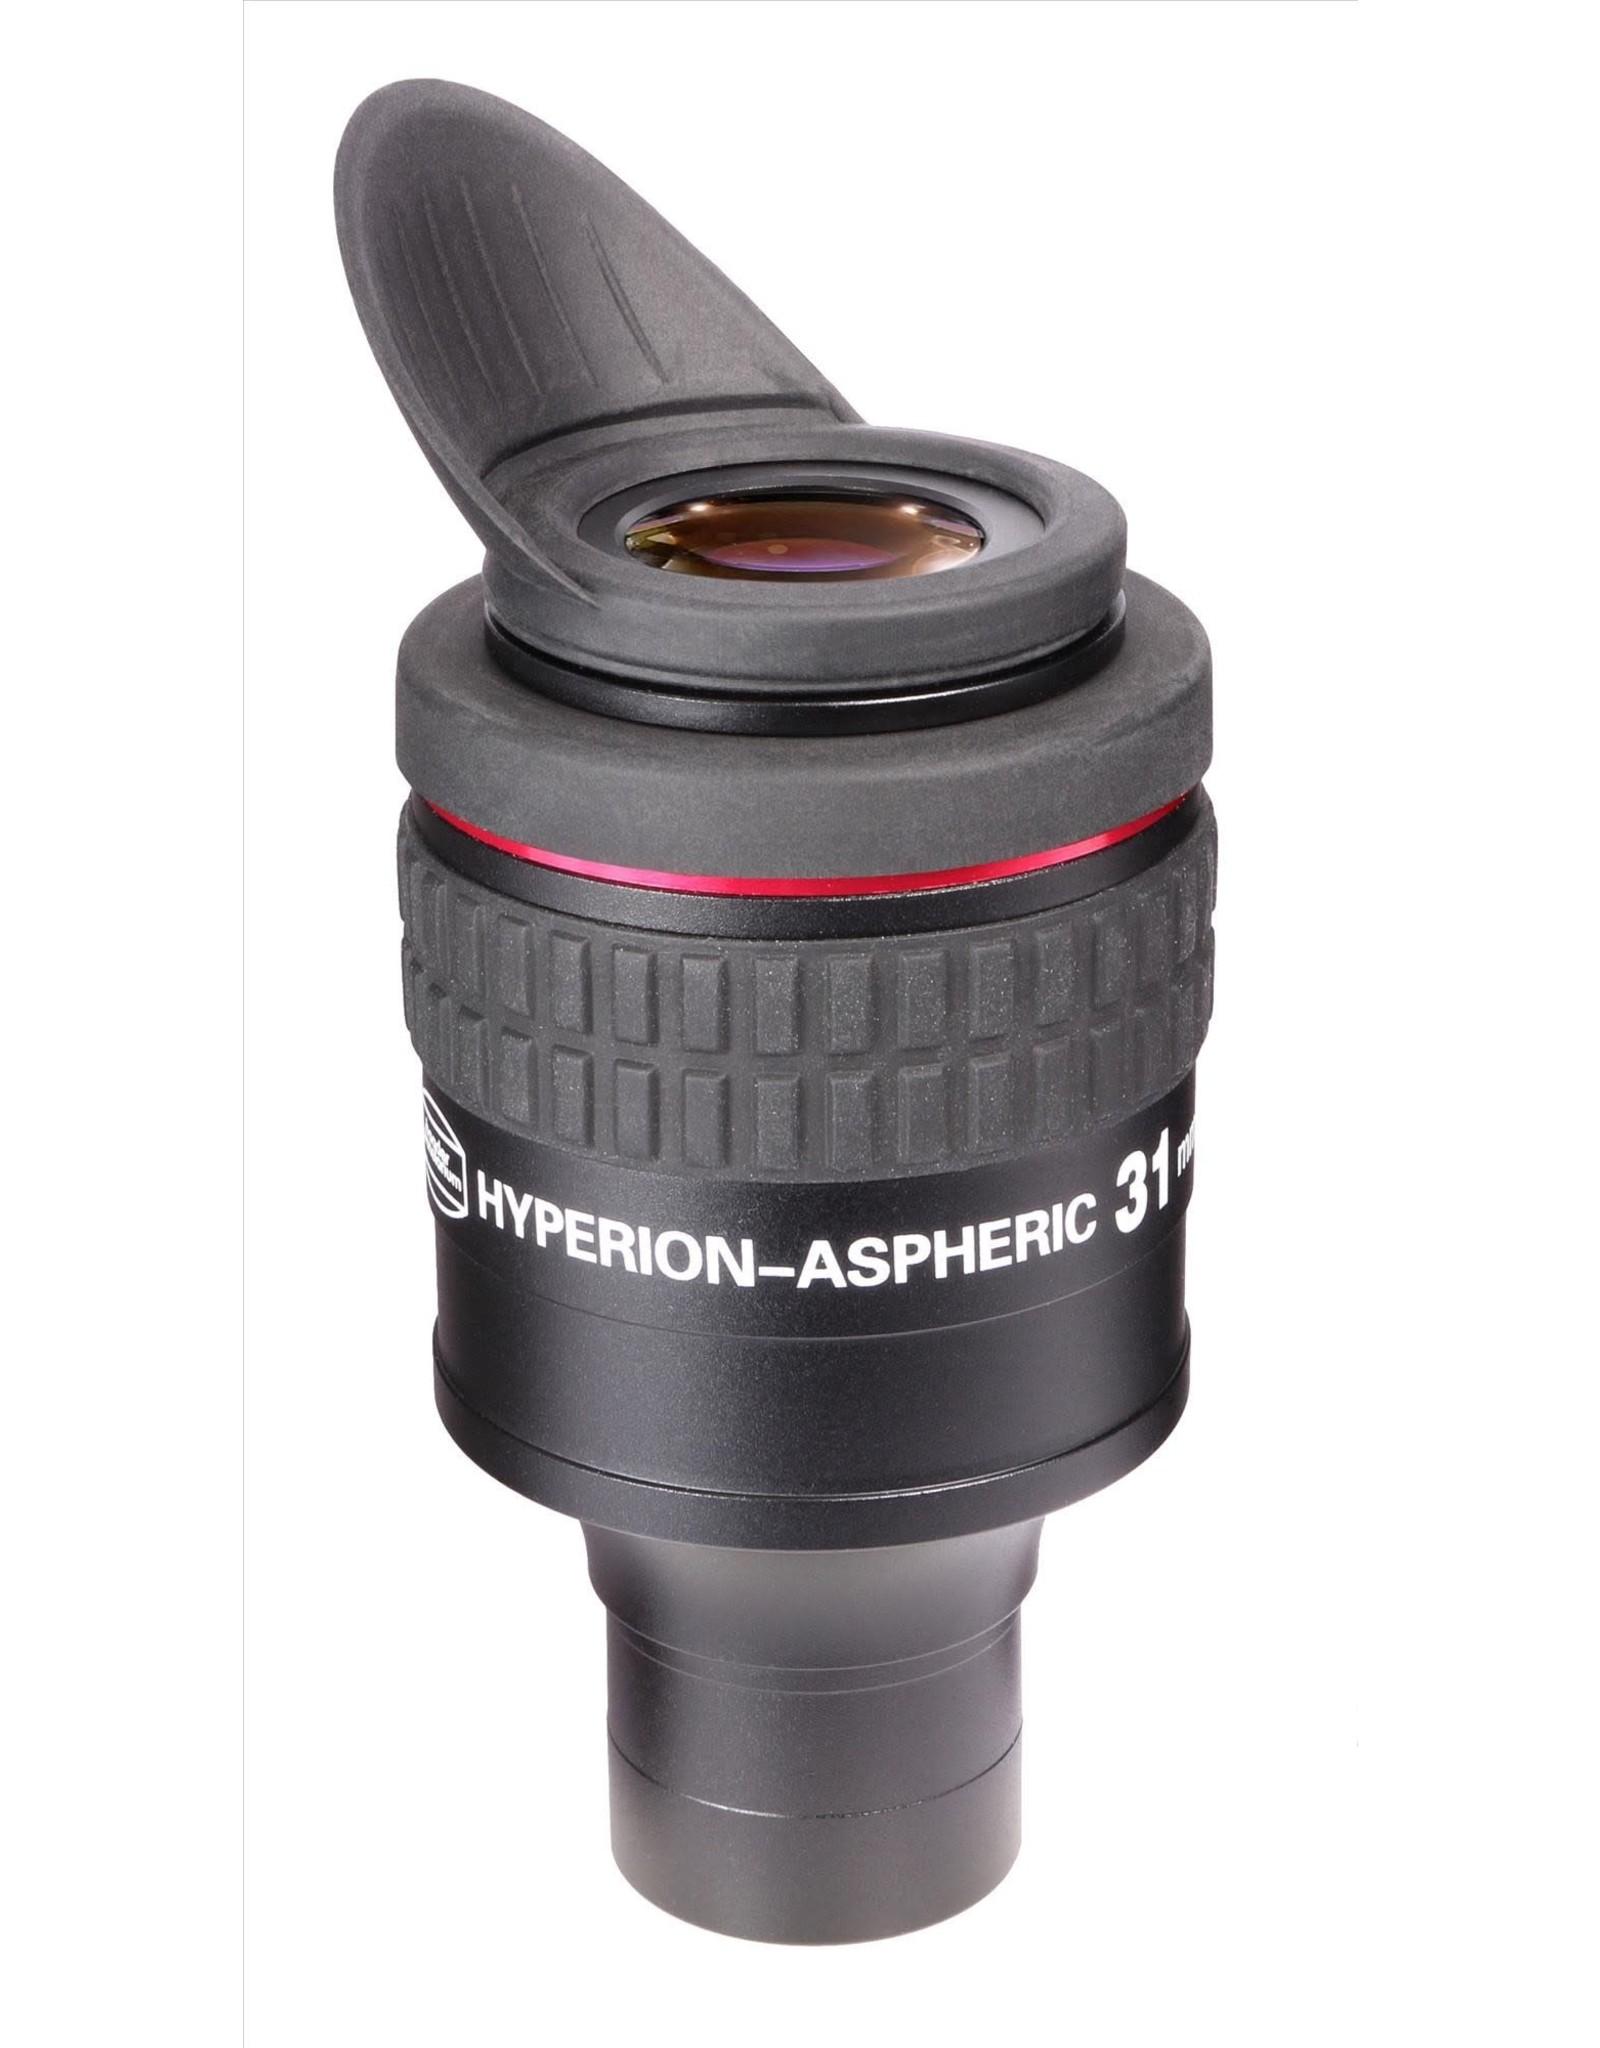 Baader Planetarium Baader Hyperion-Aspheric 72deg Modular Eyepiece 31mm